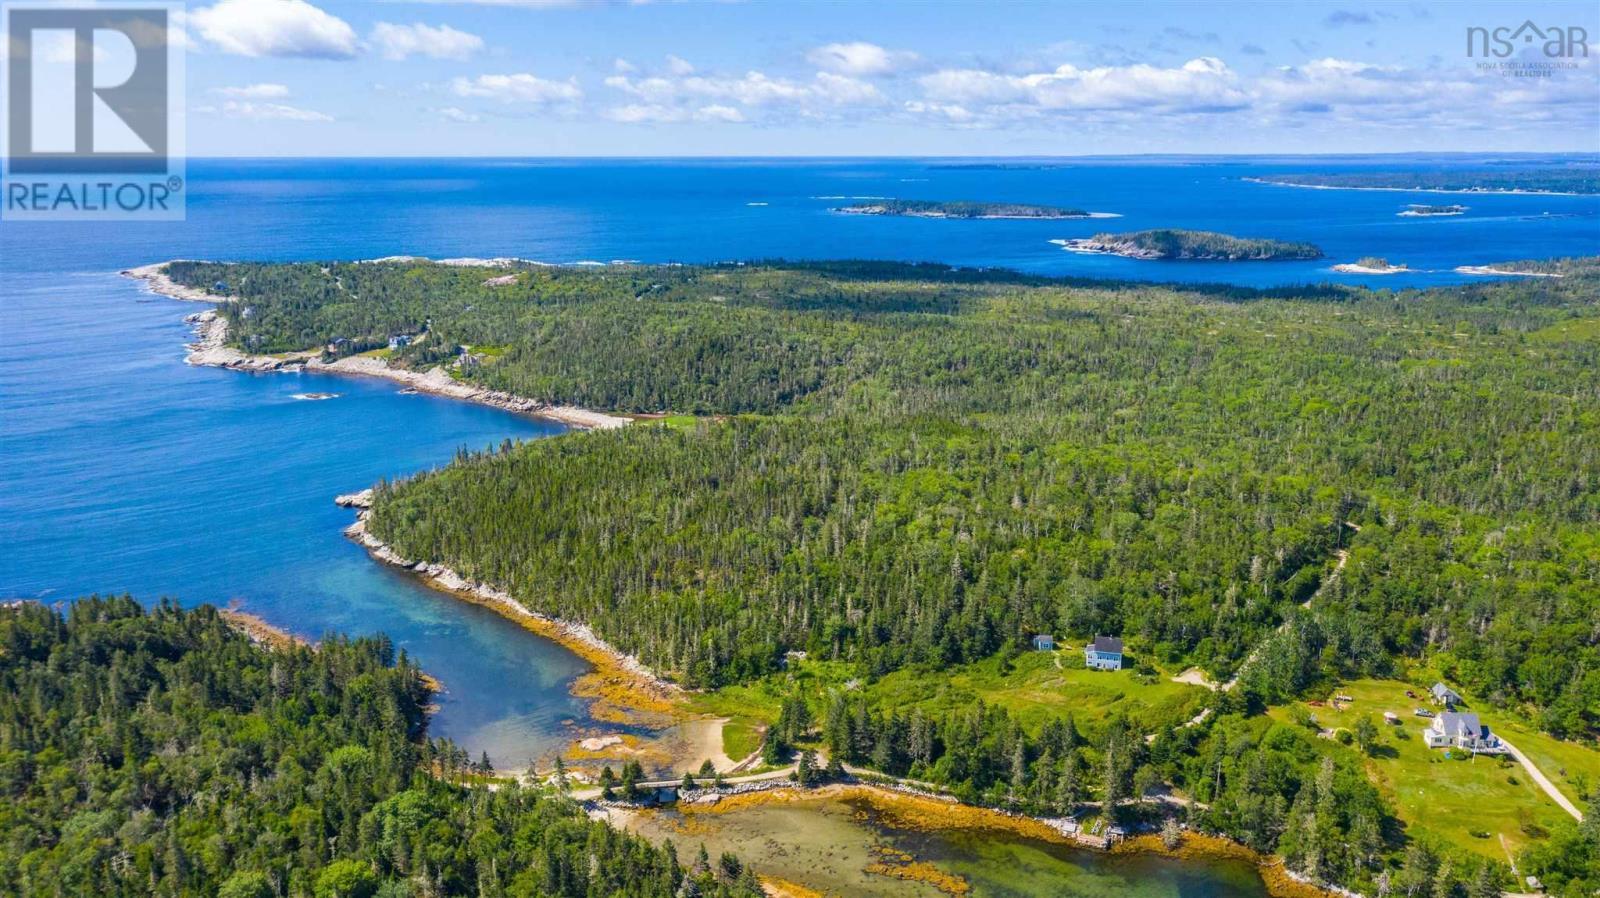 Lot W20-4 Owls Head Drive, Southwest Cove, Nova Scotia  B0J 1T0 - Photo 15 - 202125697